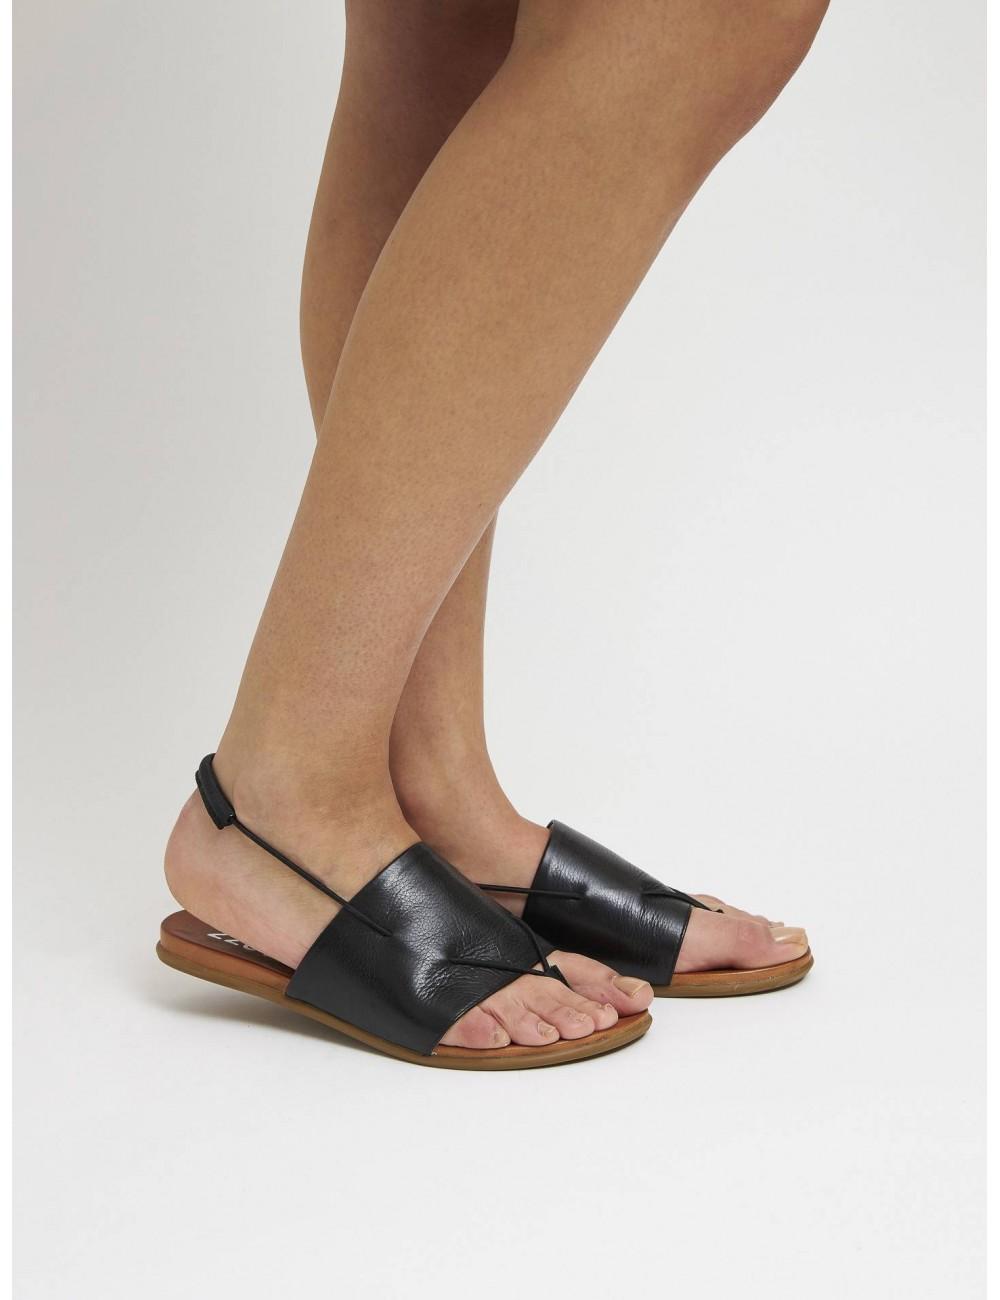 Sandal flat black skin thin ribbons